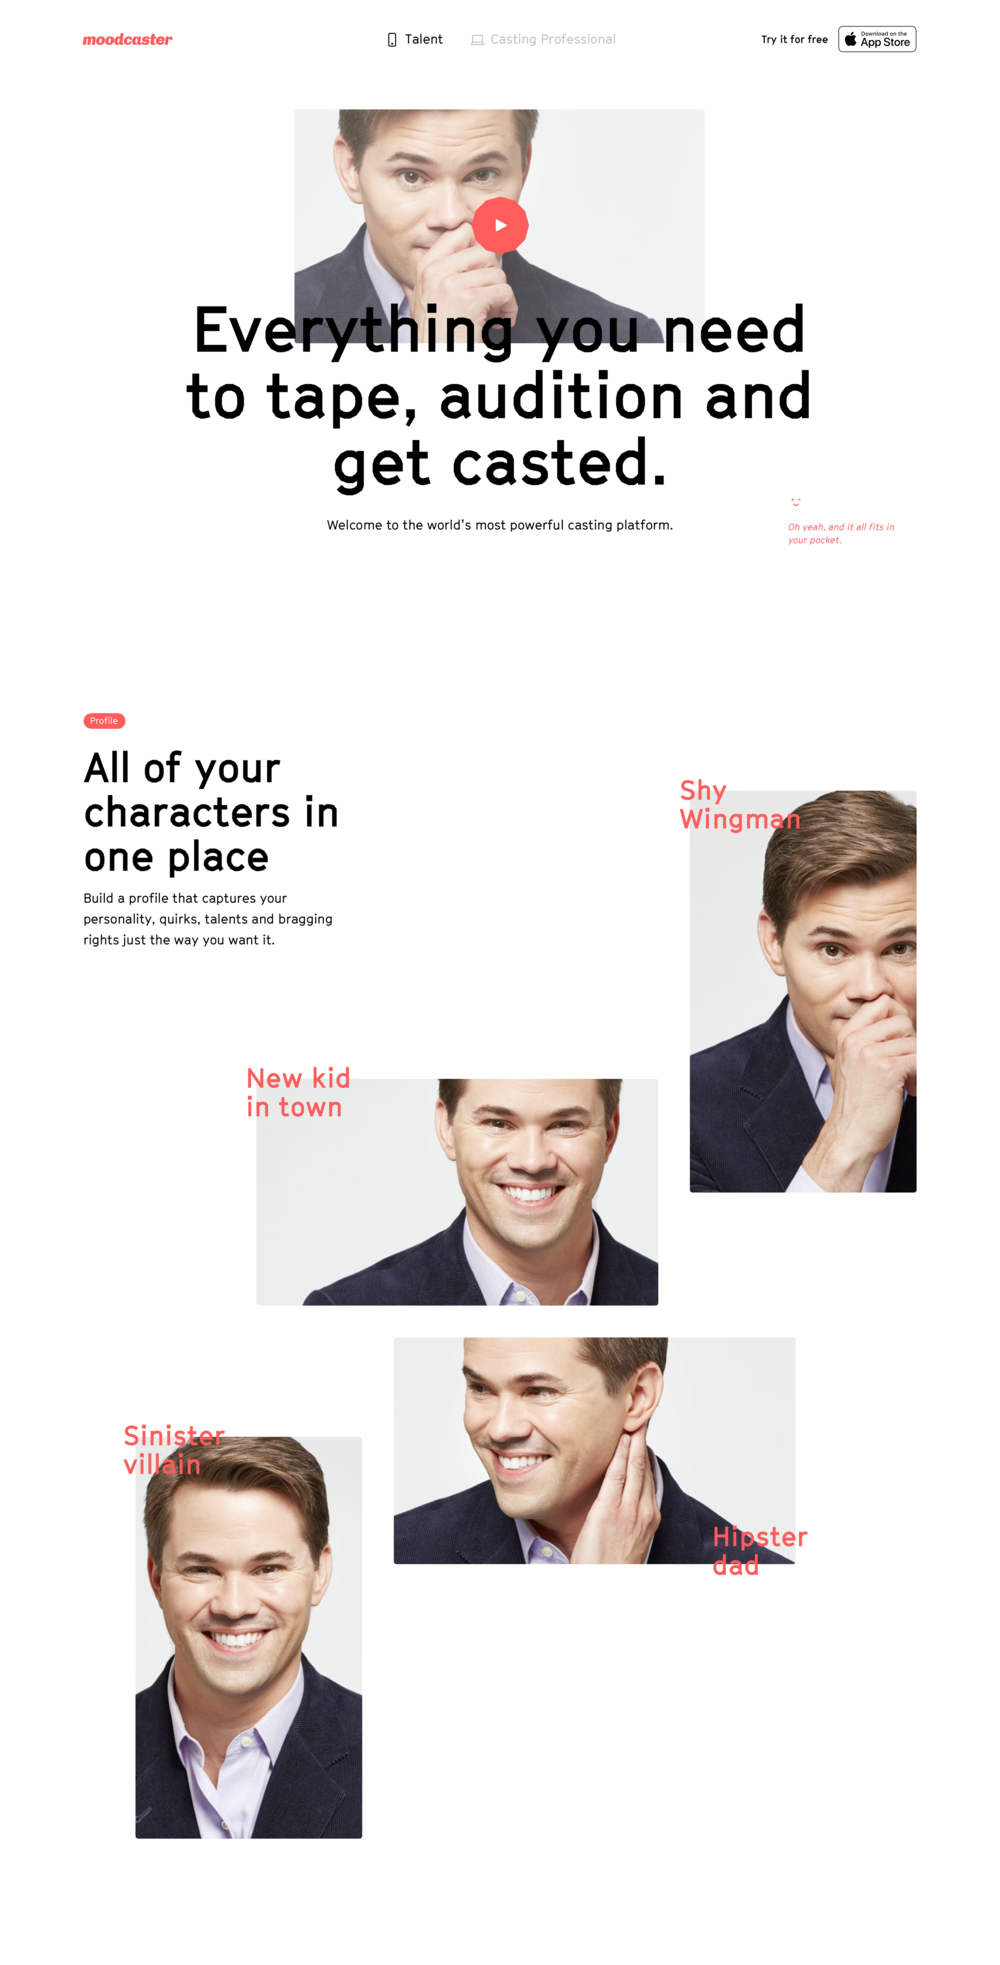 Talent-page--lg Copy 2.png